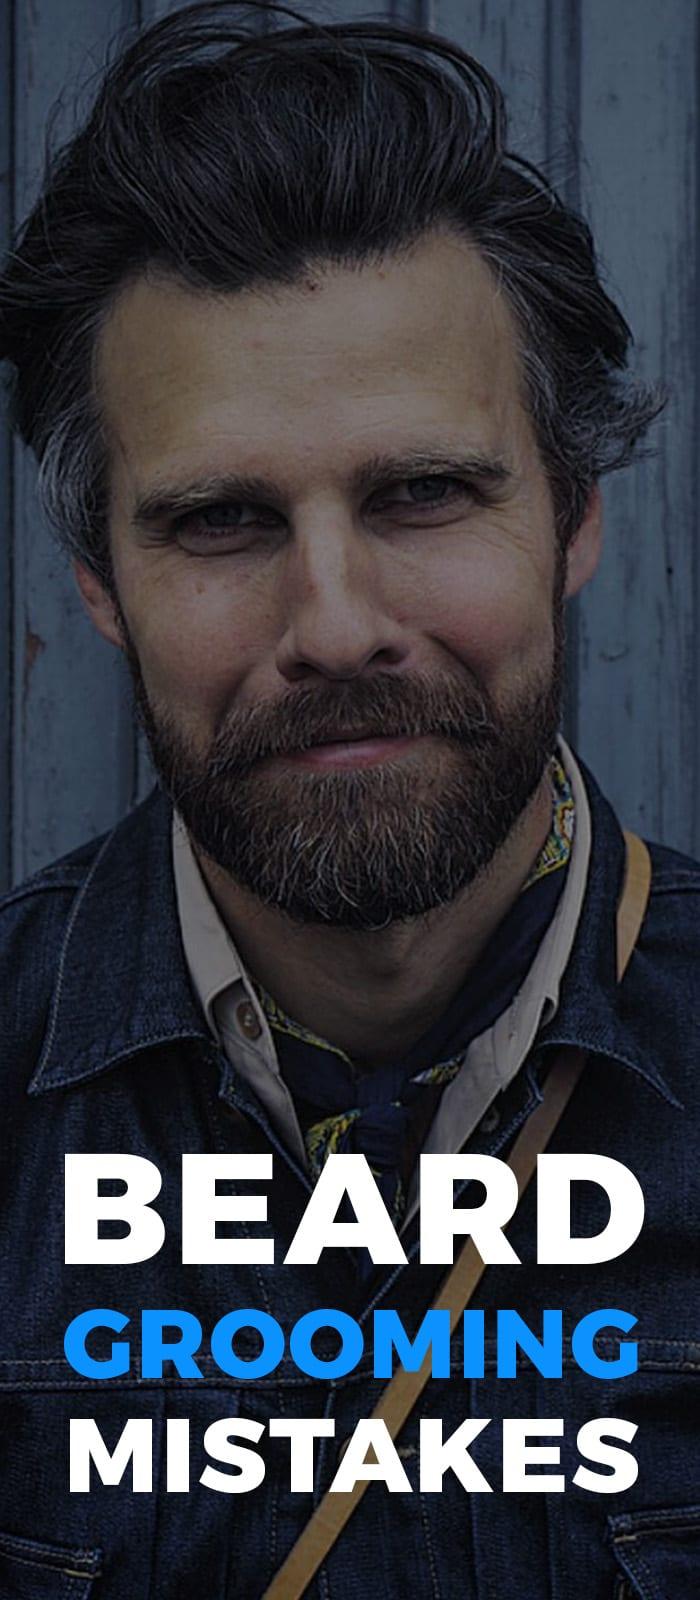 Beard Growing Mistakes!